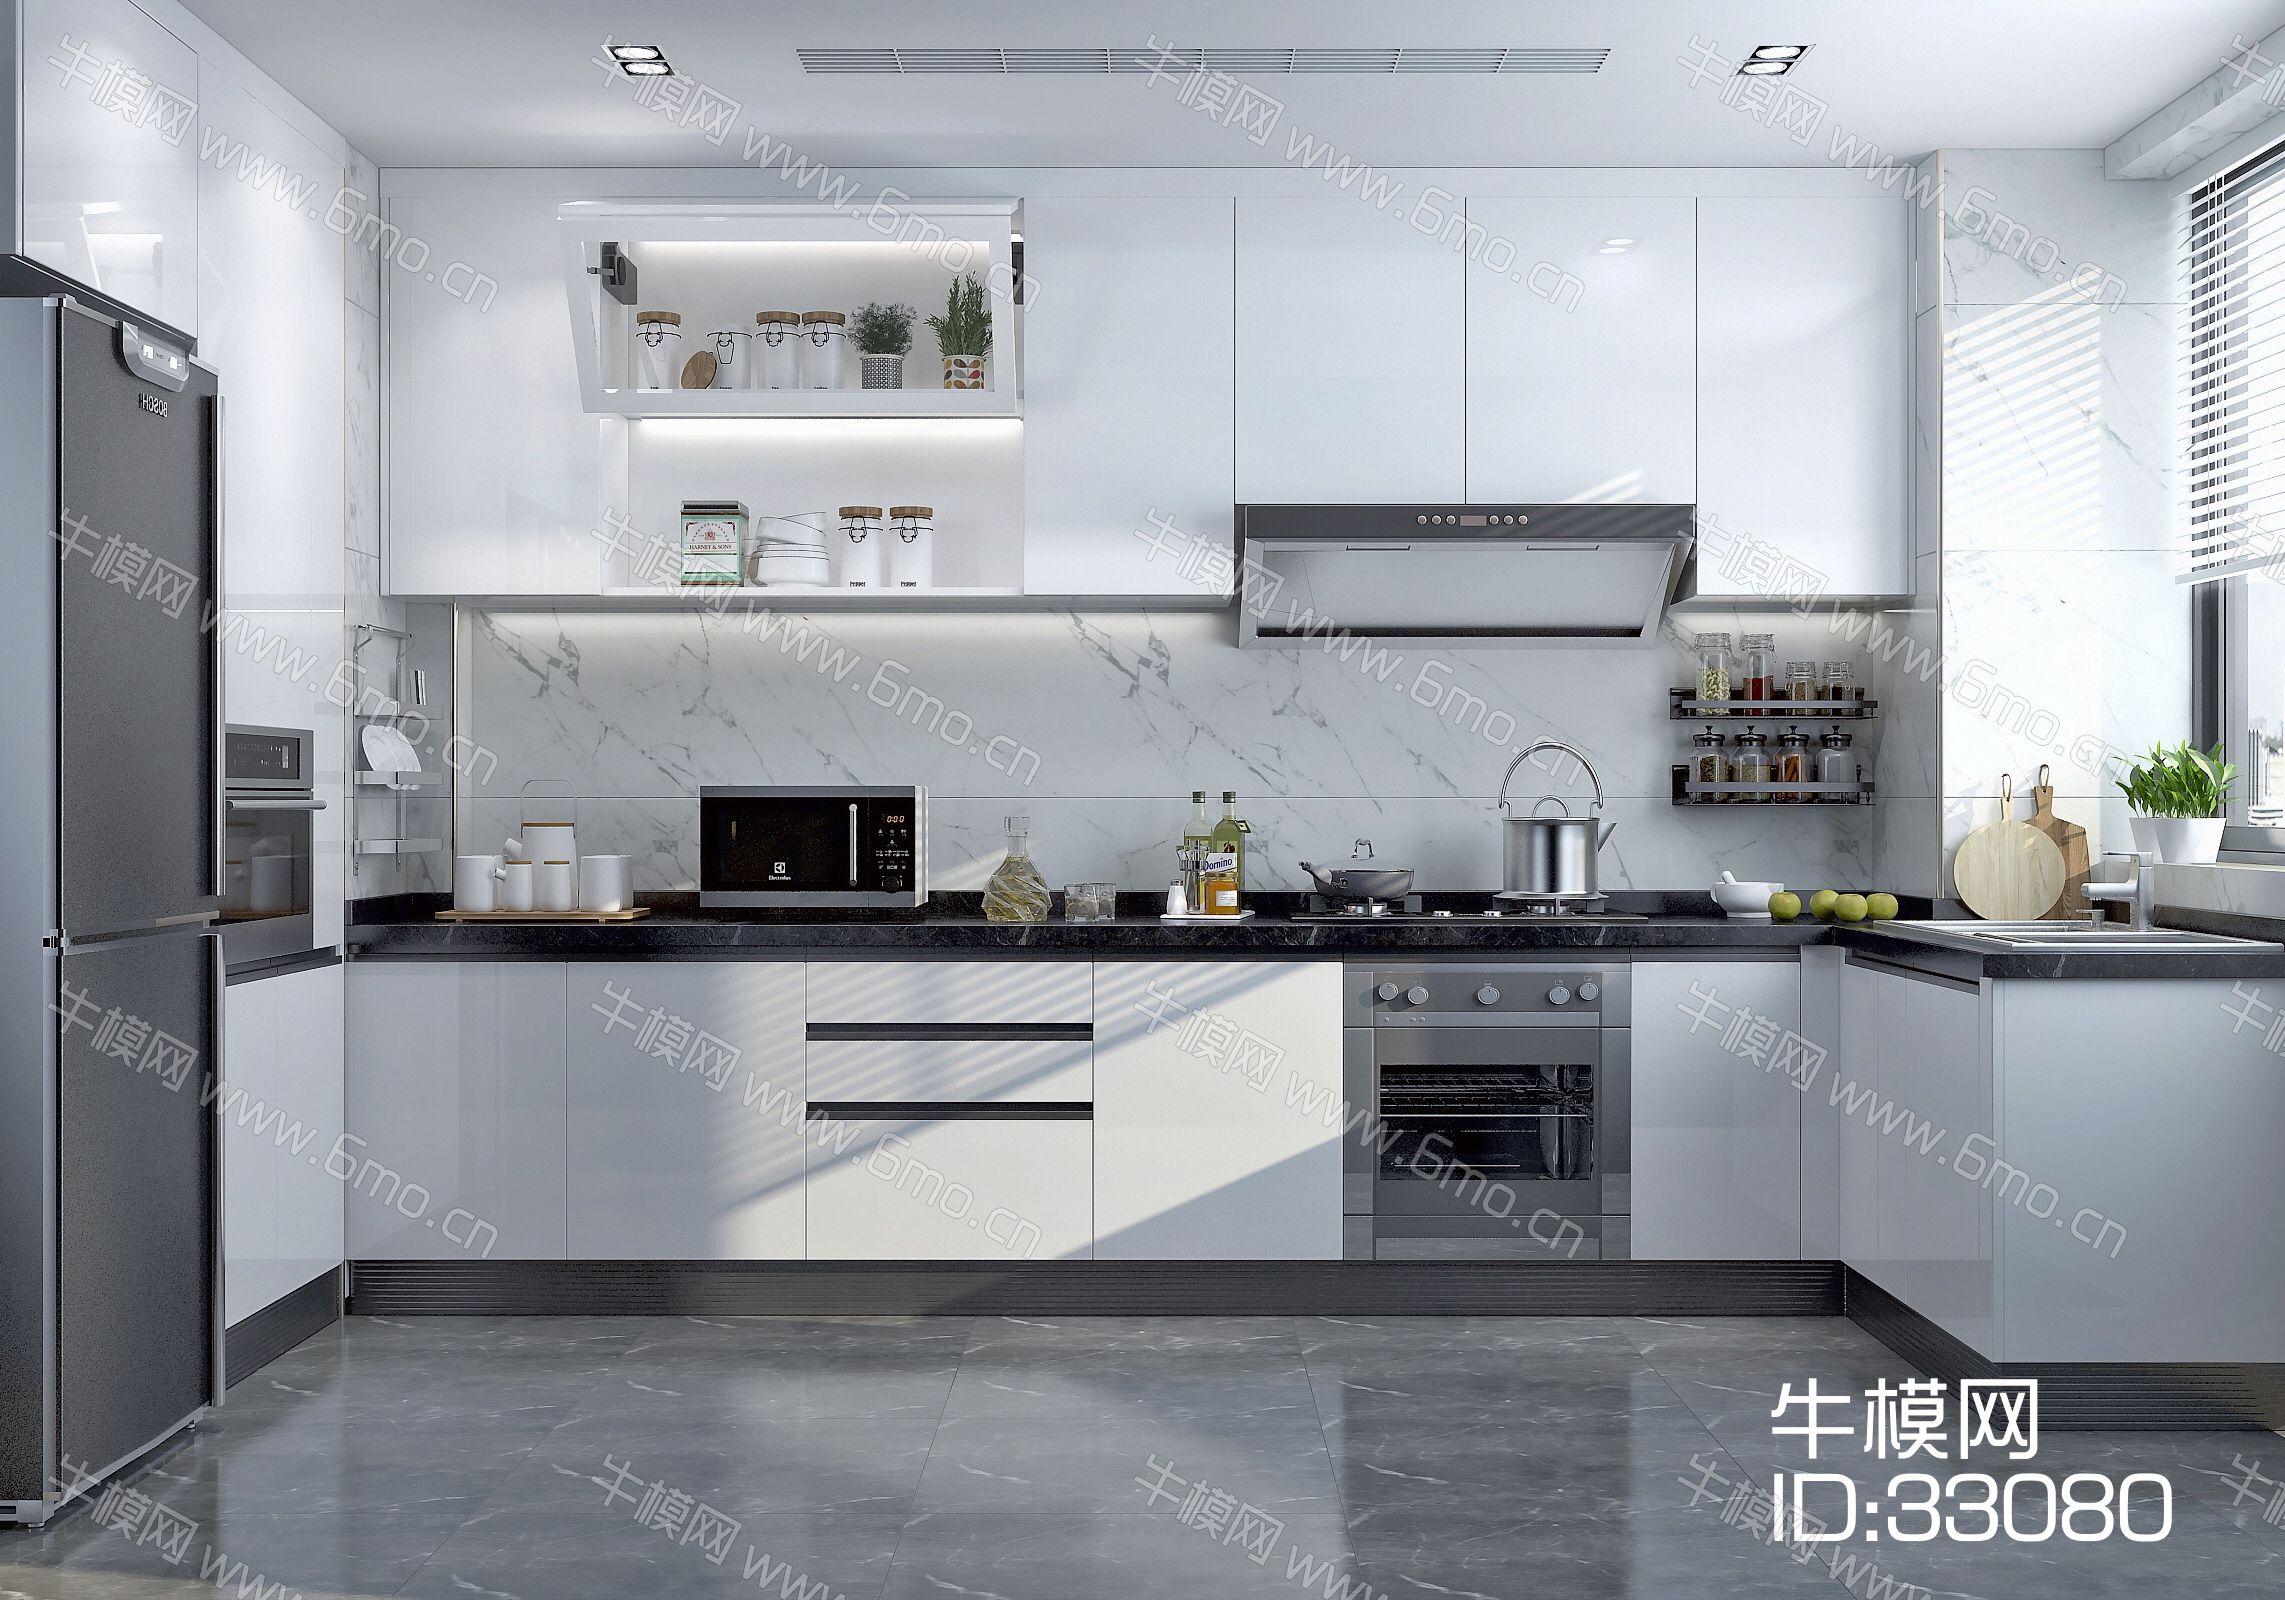 3d透明玻璃材质_现代厨房橱柜 厨房电器 厨房用品3D模型下载_id:33080_牛模网